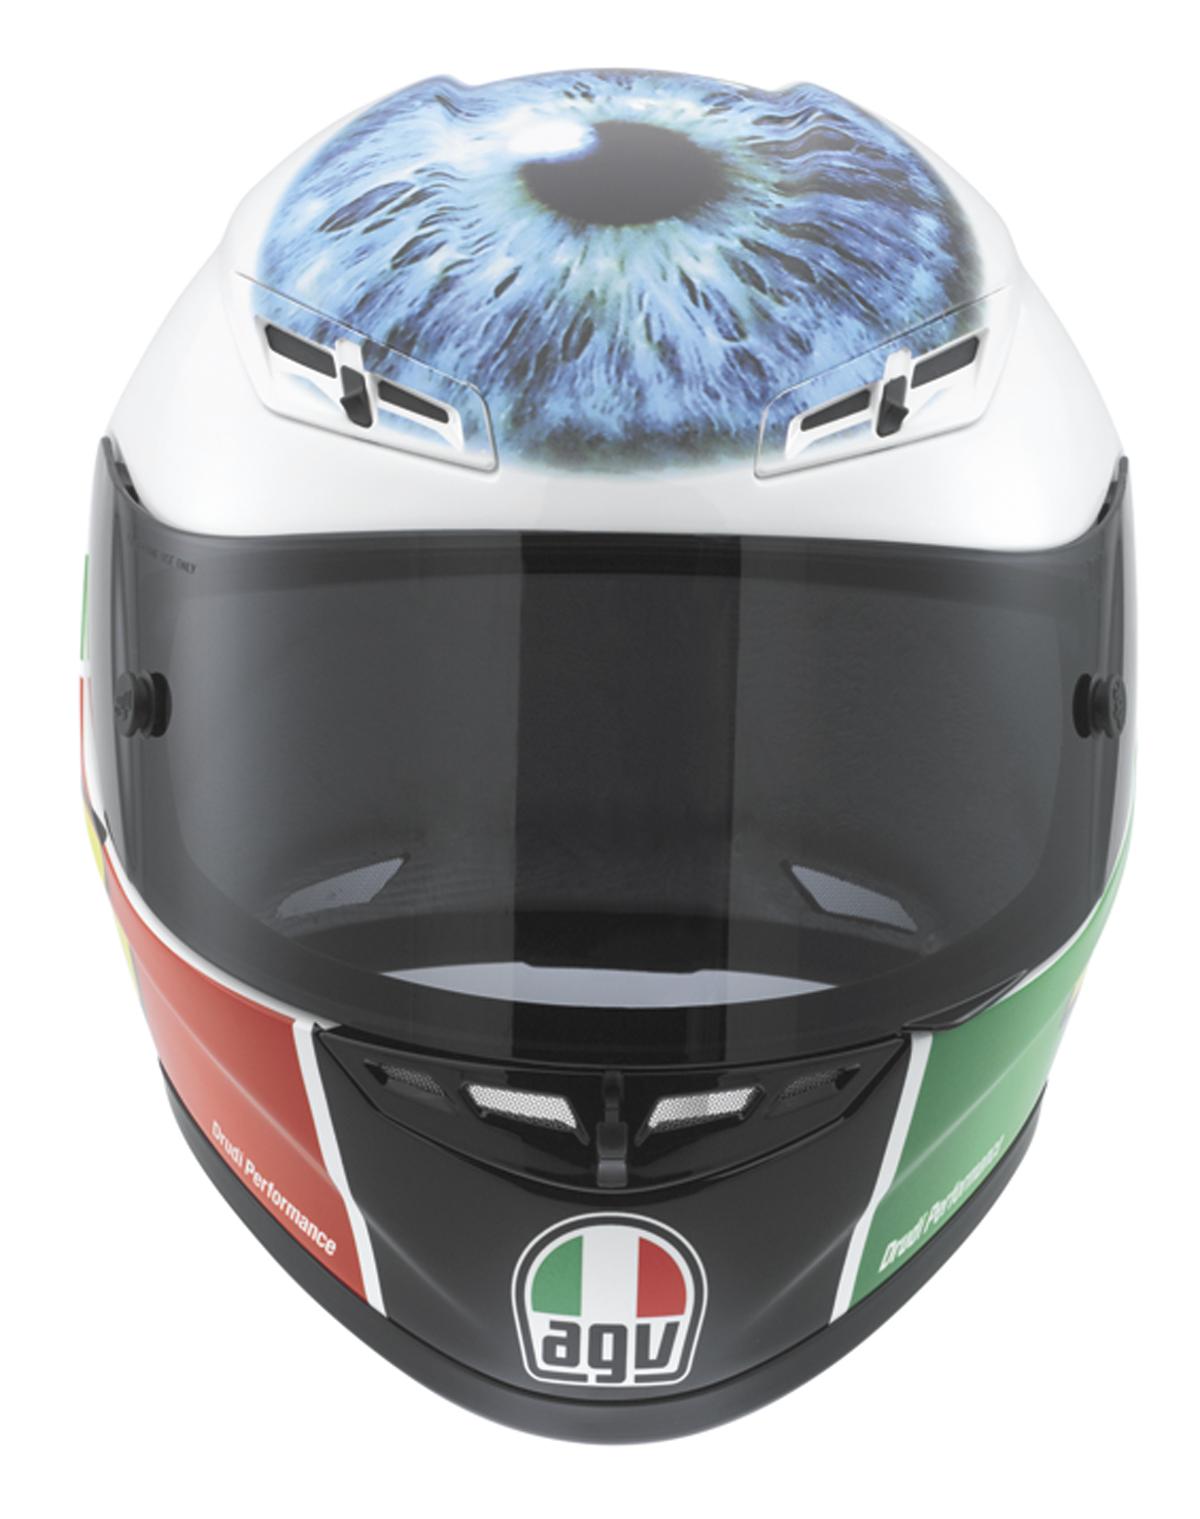 Мотошлем AGV GP-TECH Limited Edition Valentino's Eye  Артмото - купить квадроцикл в украине и харькове, мотоцикл, снегоход, скутер, мопед, электромобиль